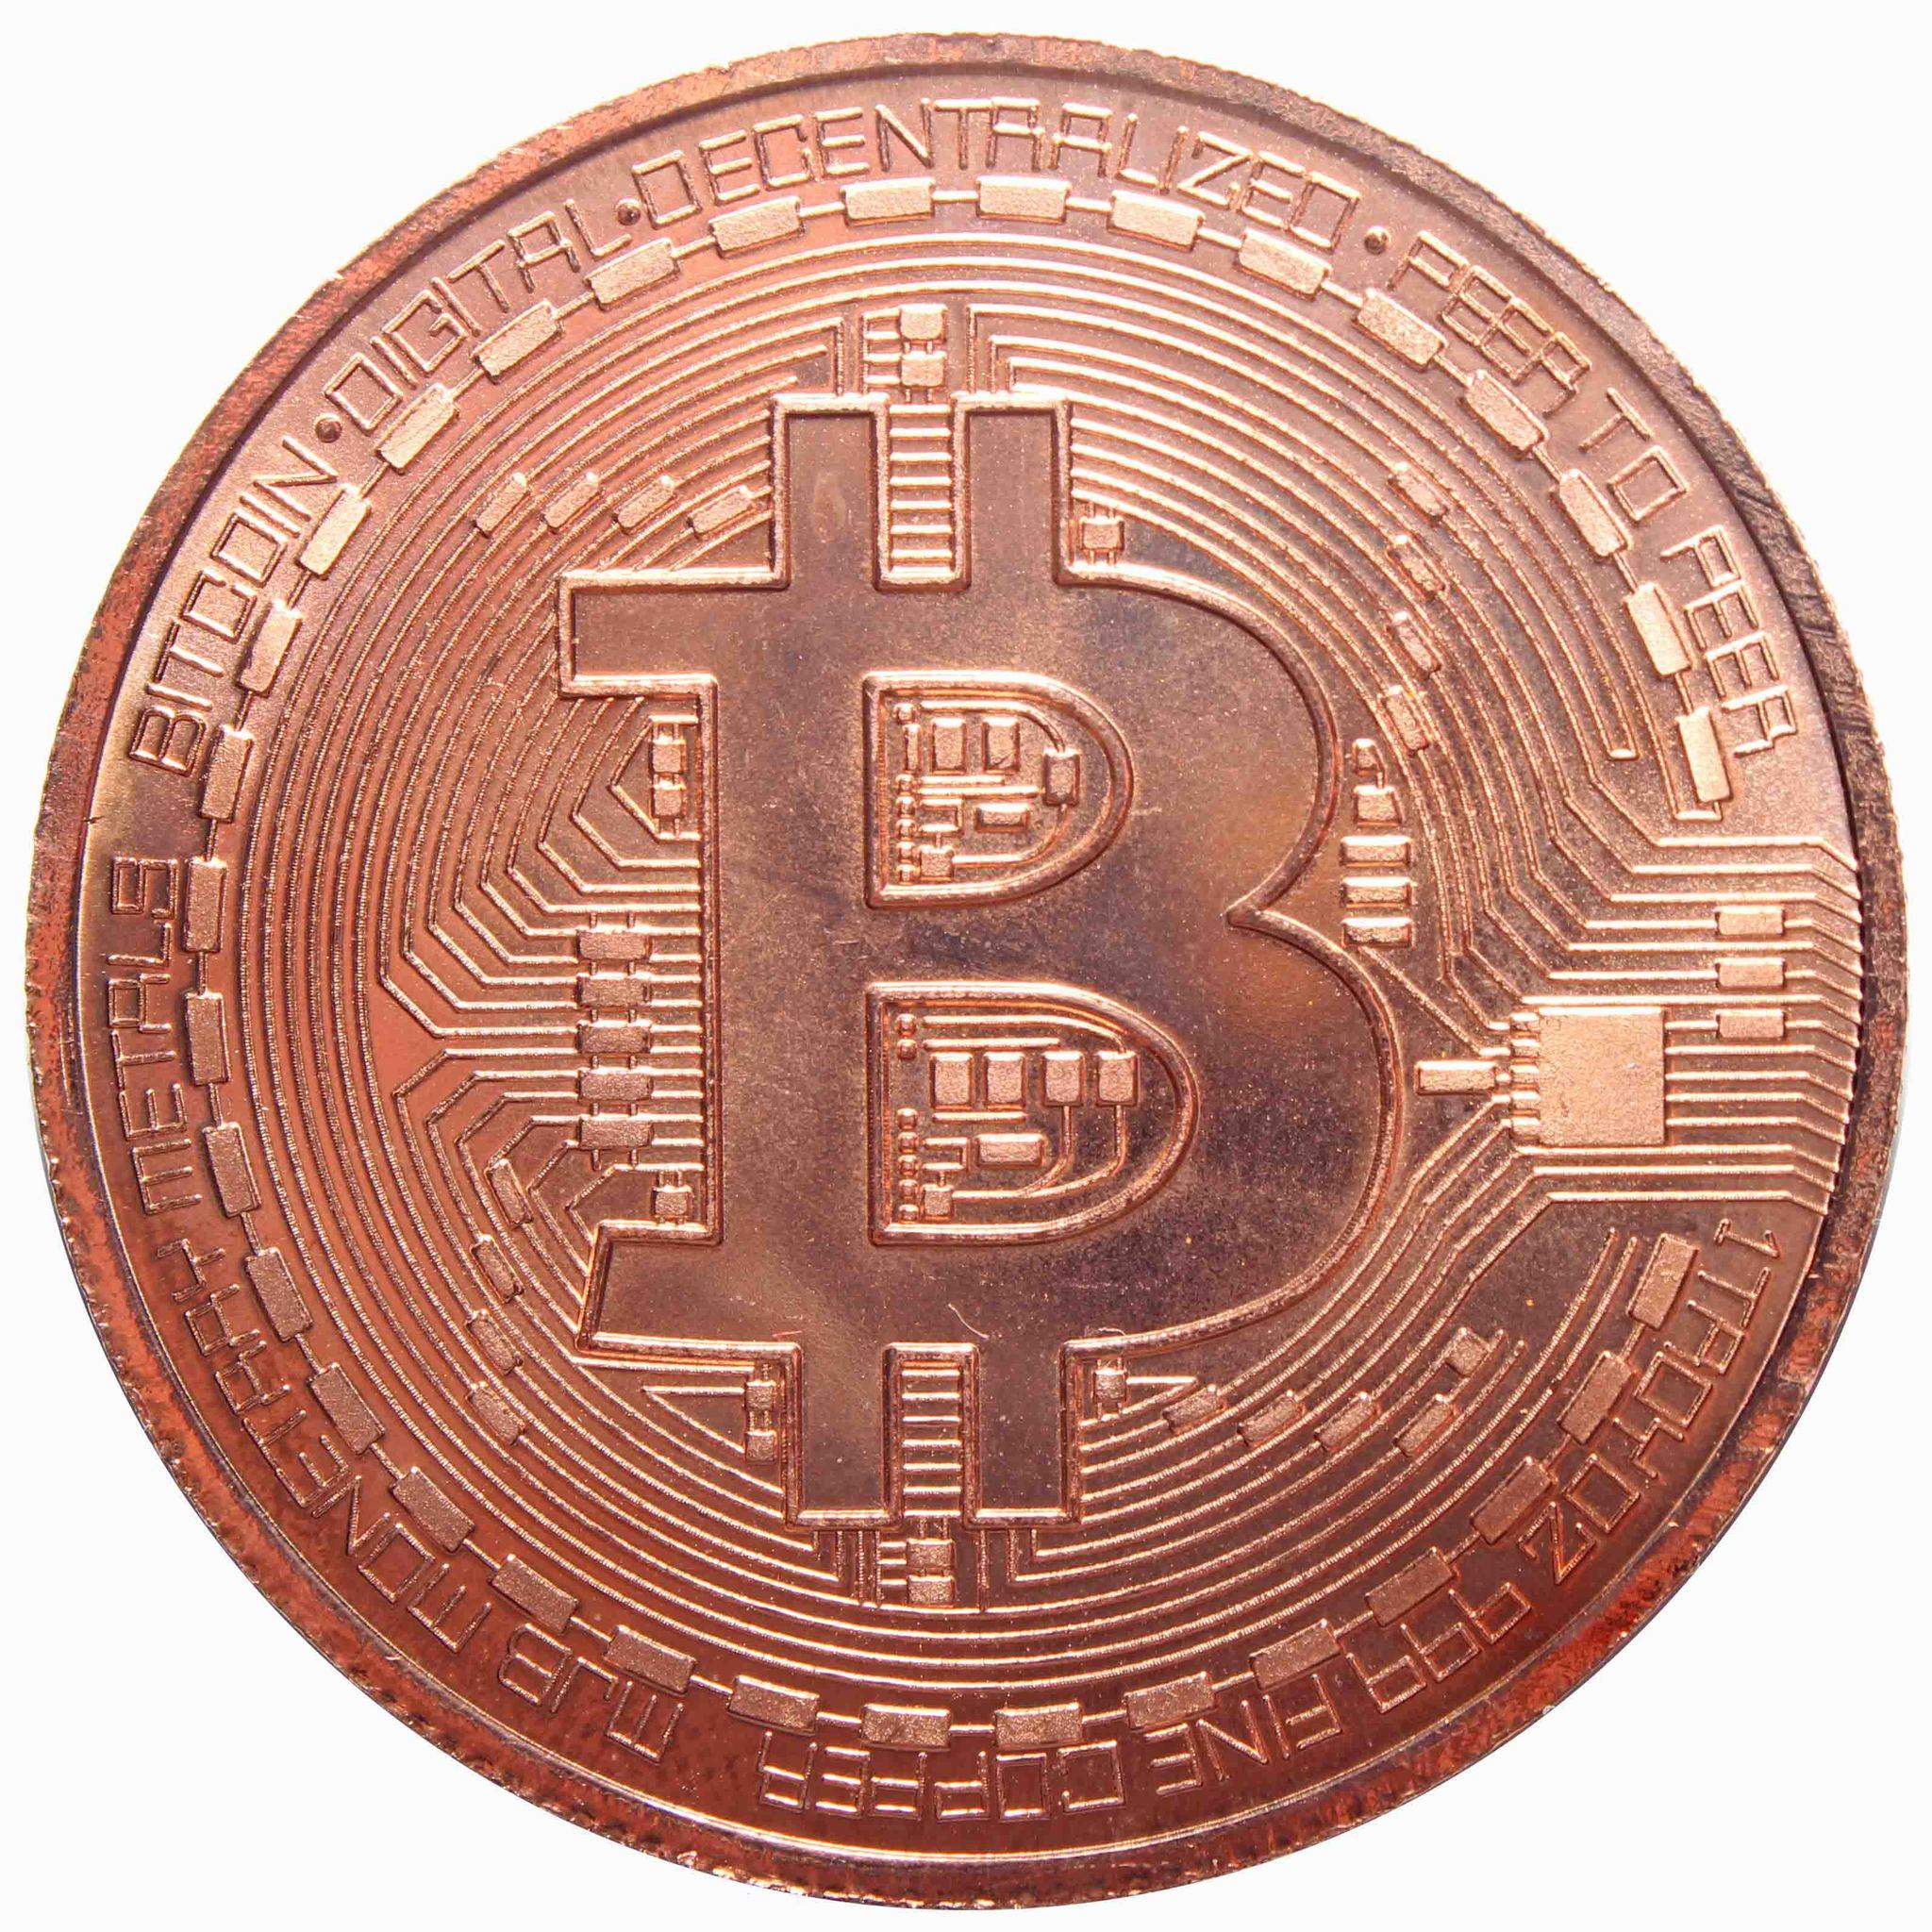 Бронзовый Биткоин (сувенирная монета)